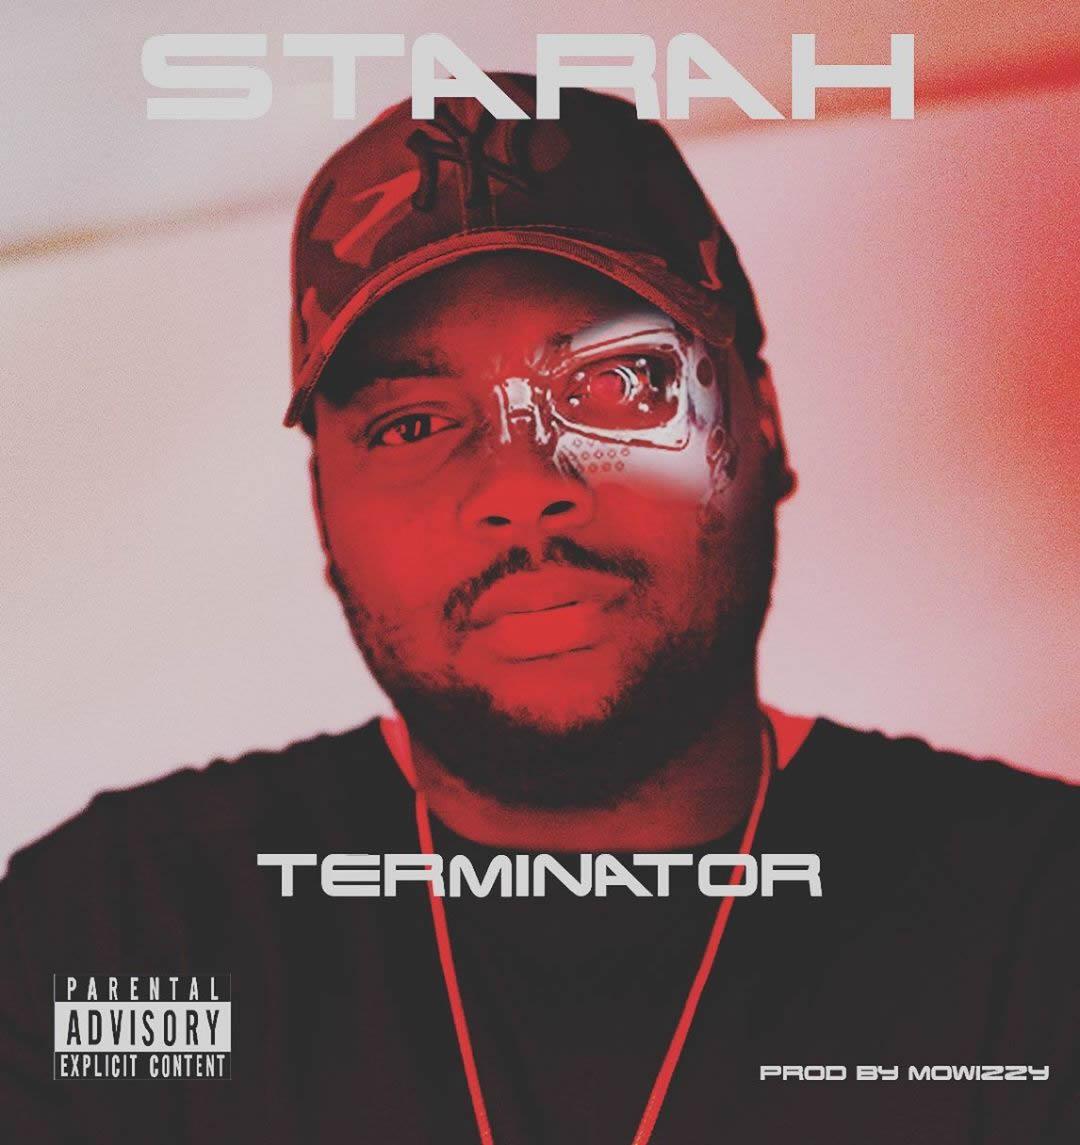 Starah Terminator